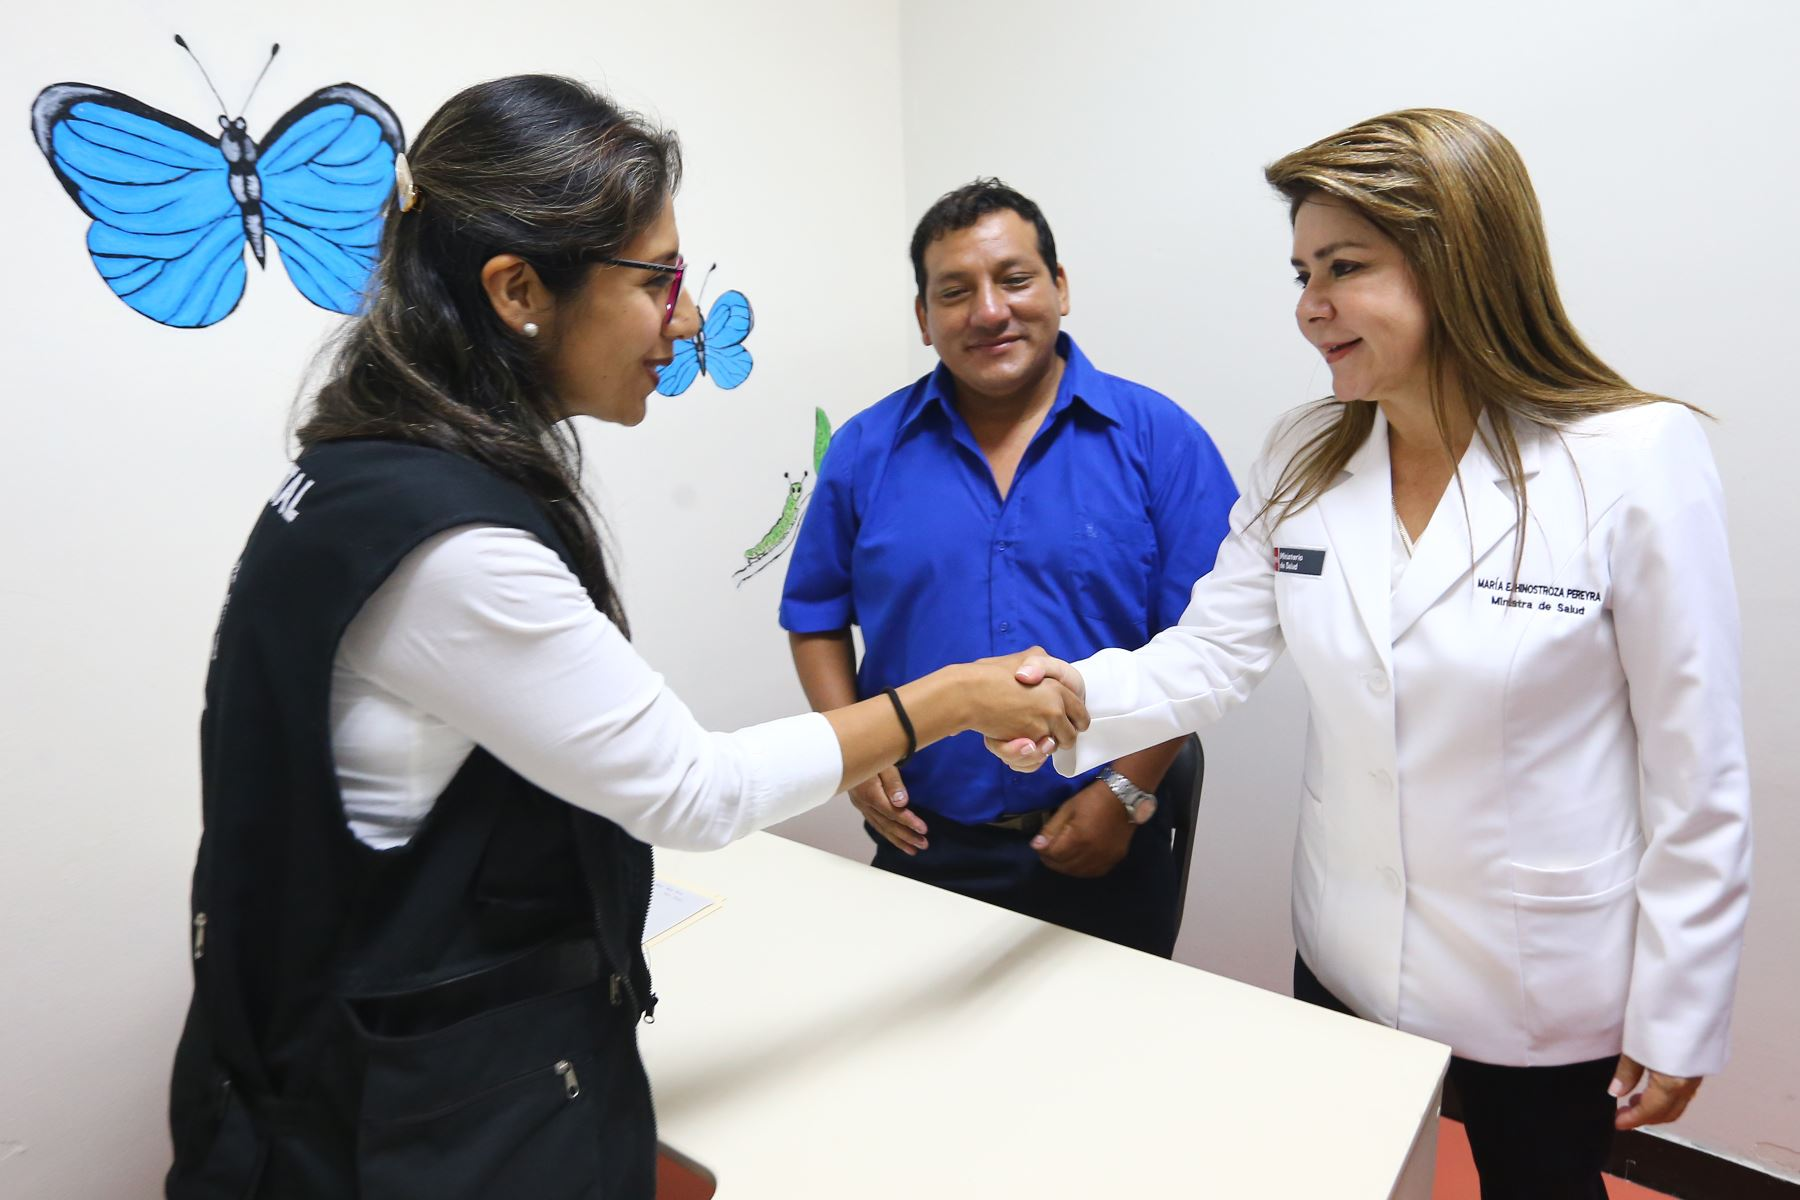 Ministra de Salud Dra: Elizabeth Hinostroza,Inaugura Centro de Salud Mental Comunitaria en Carmen de La Legua.Foto:ANDINA/Héctor Vinces.